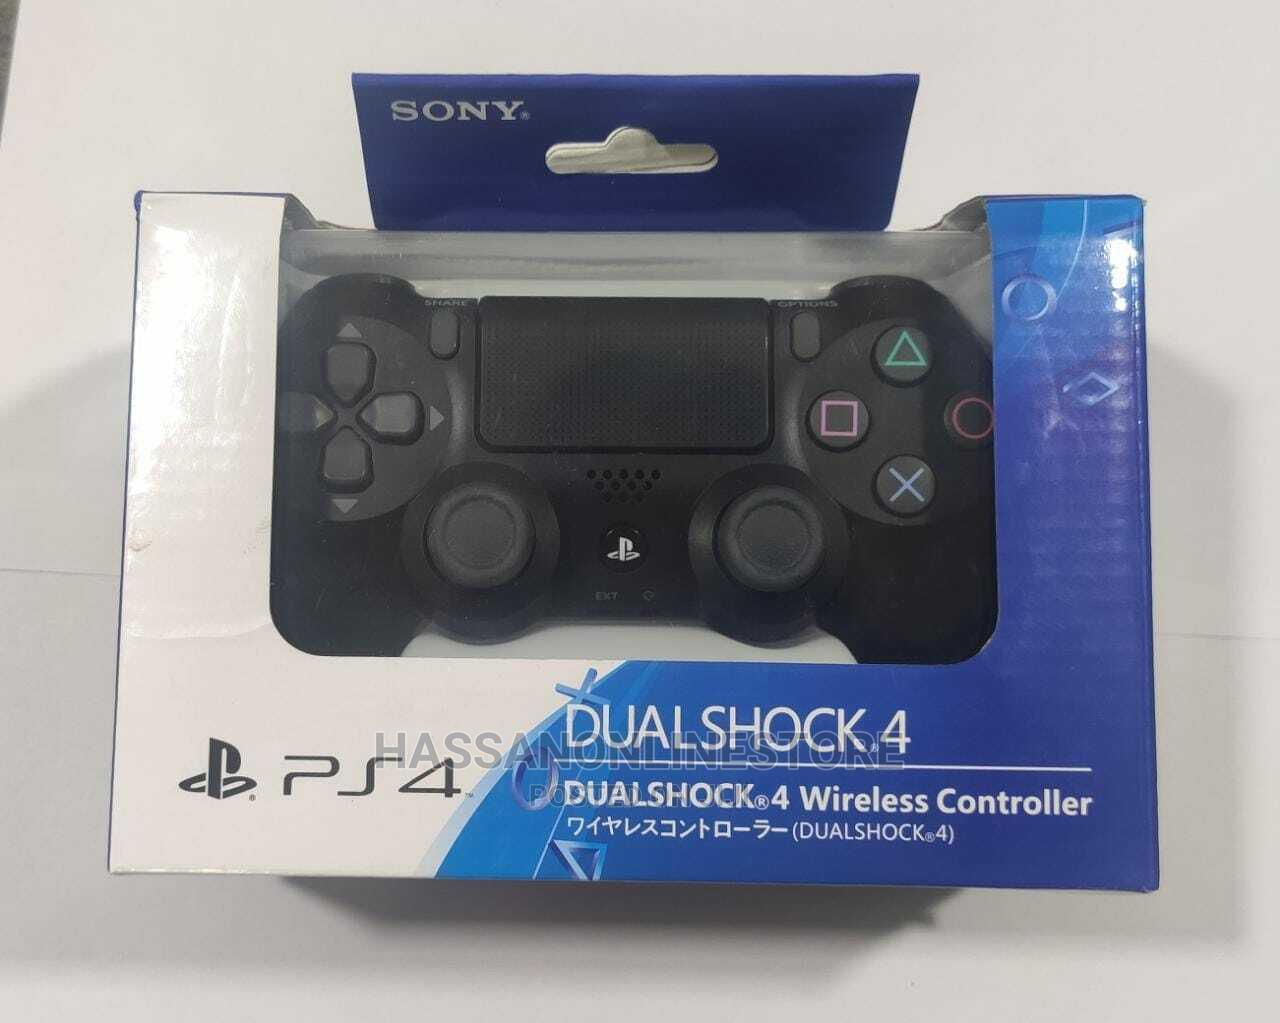 Playstation 4 Dualshock 4 Wireless Controller - Jet Black